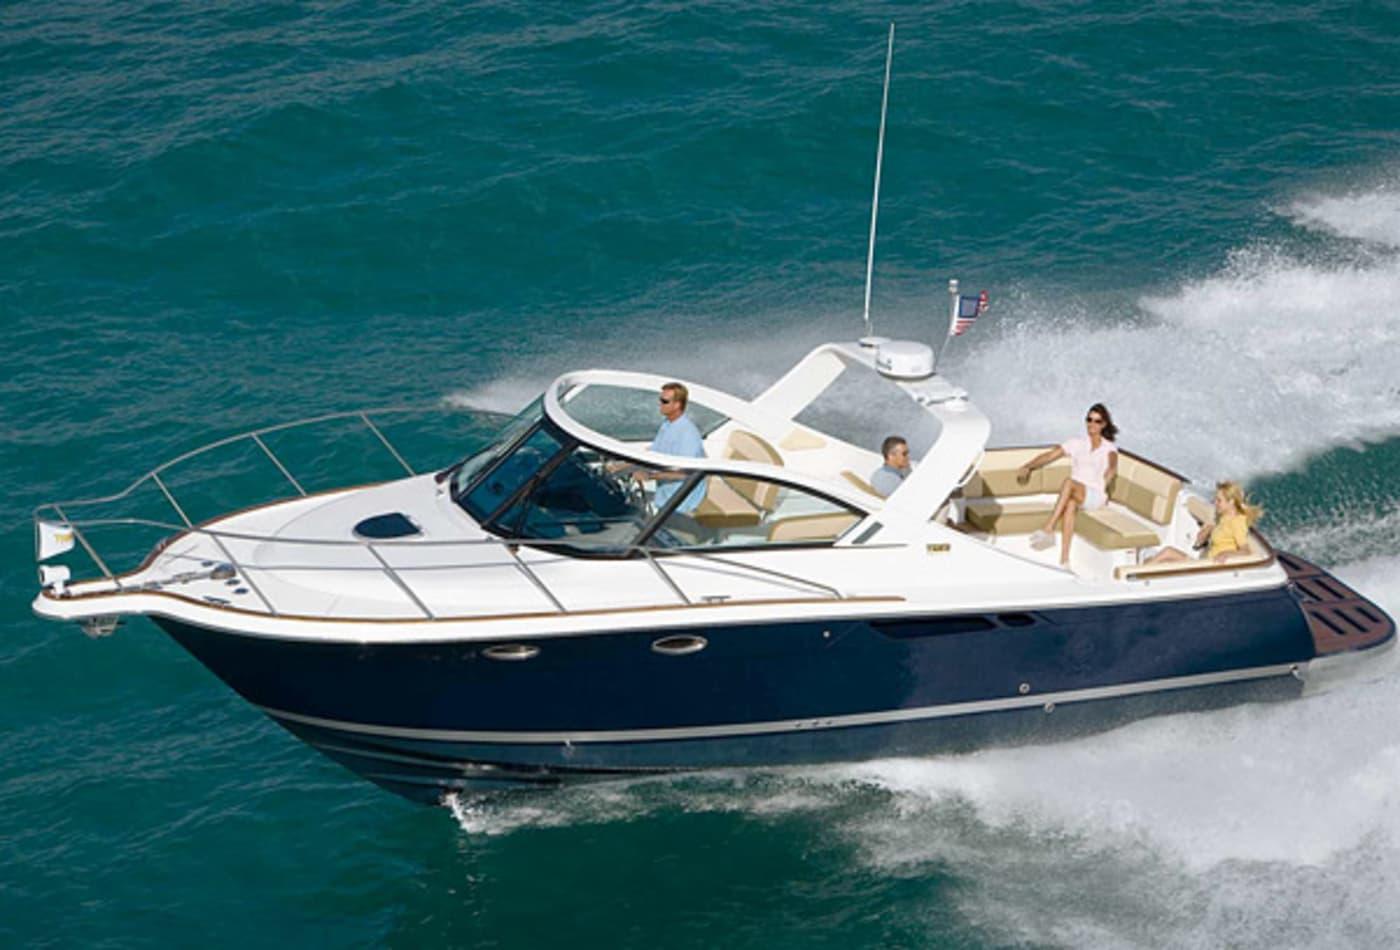 Scenes-from-2012-boat-show-tiara3100.jpg